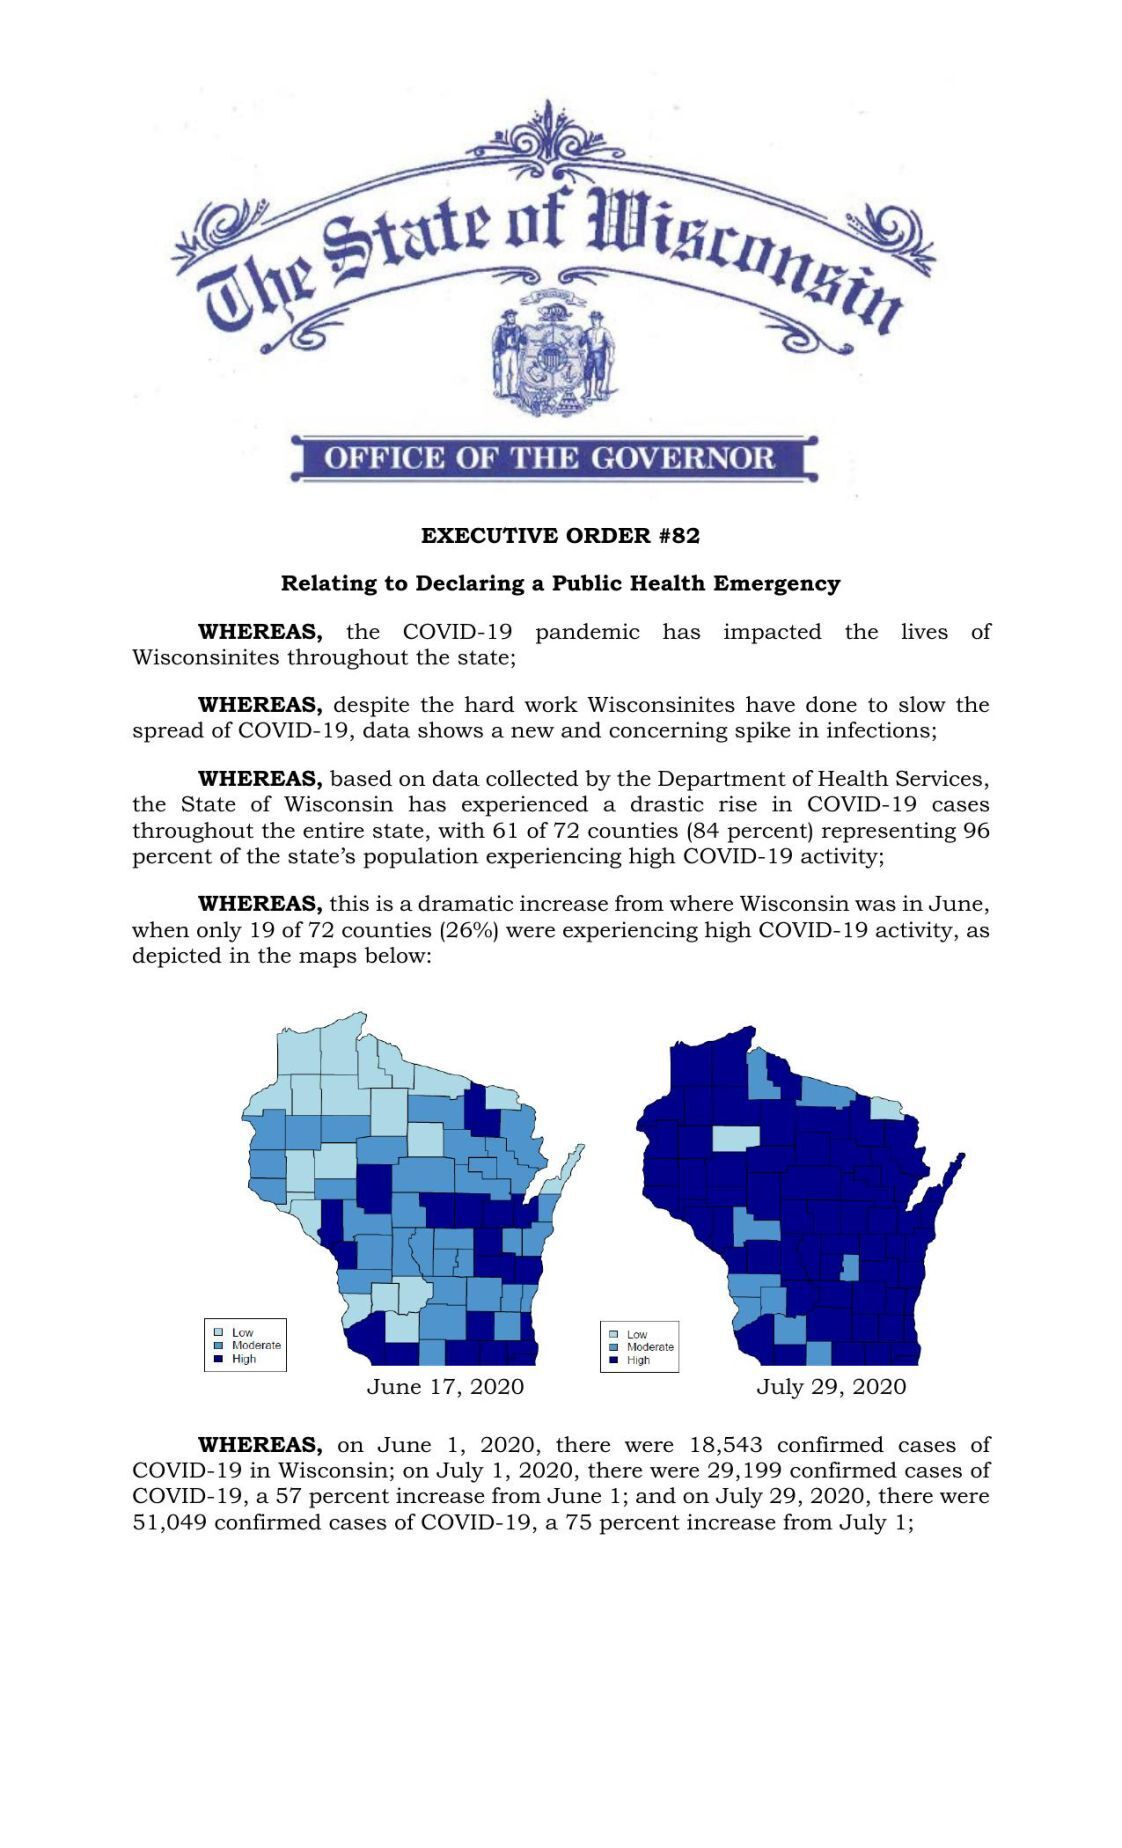 Gov. Tony Evers' executive order 82 declaring a public health emergency